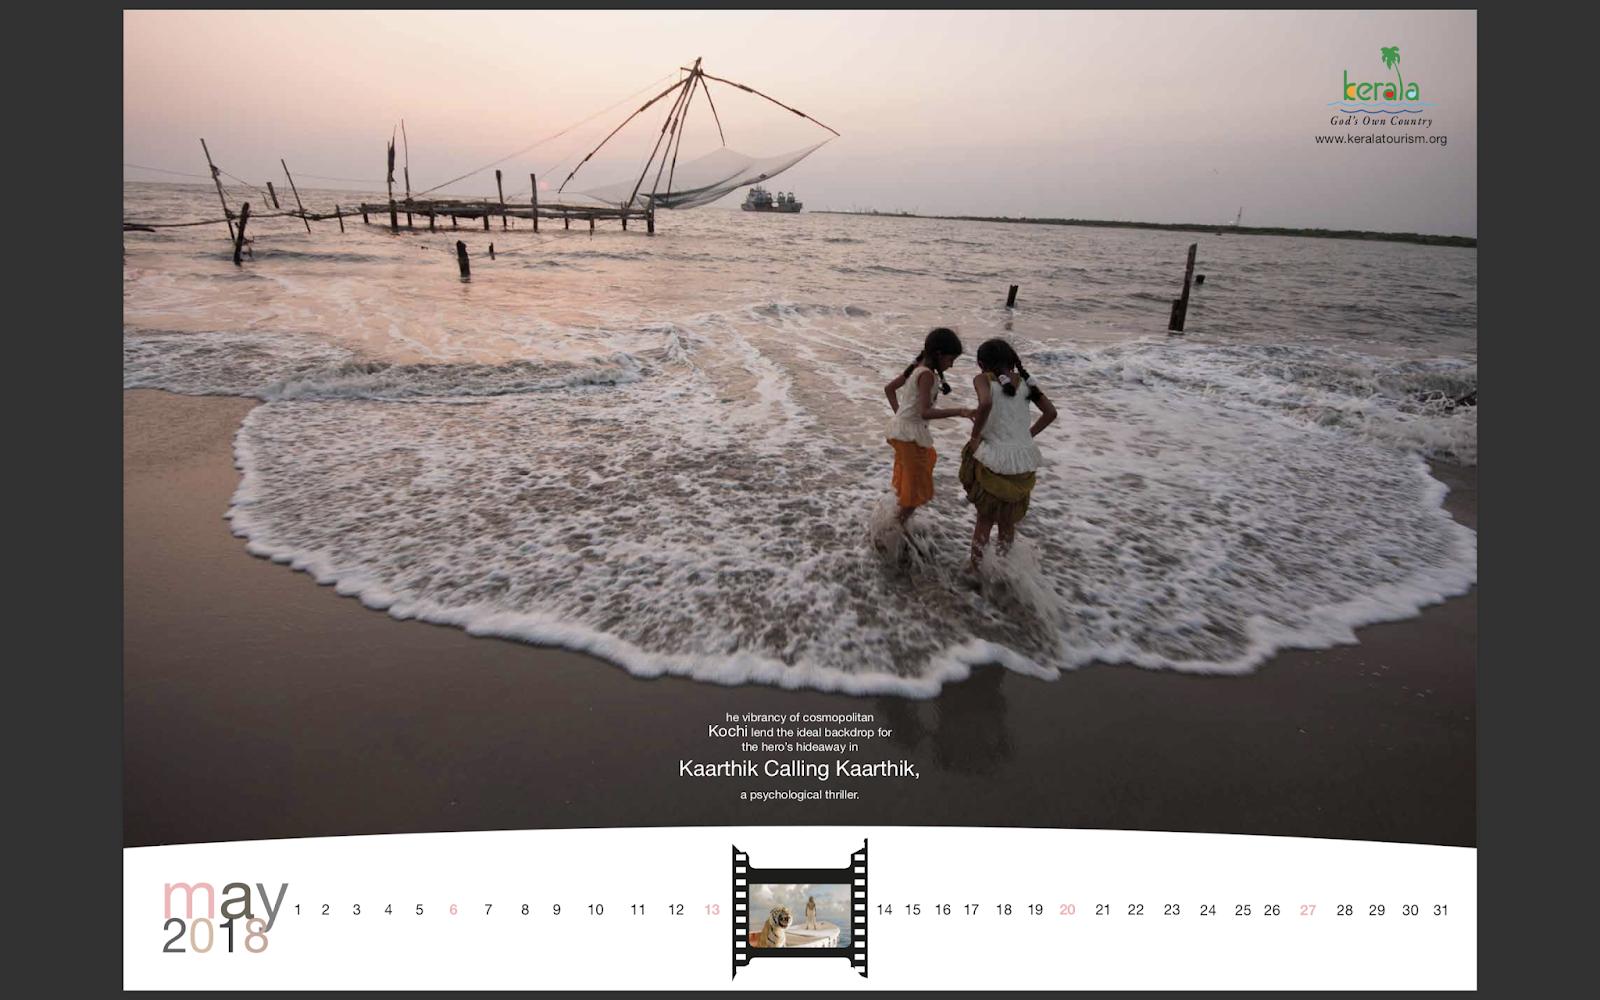 Kerala Tourism 2018 Calendar mock-up 6 | Stark Communications Pvt Ltd